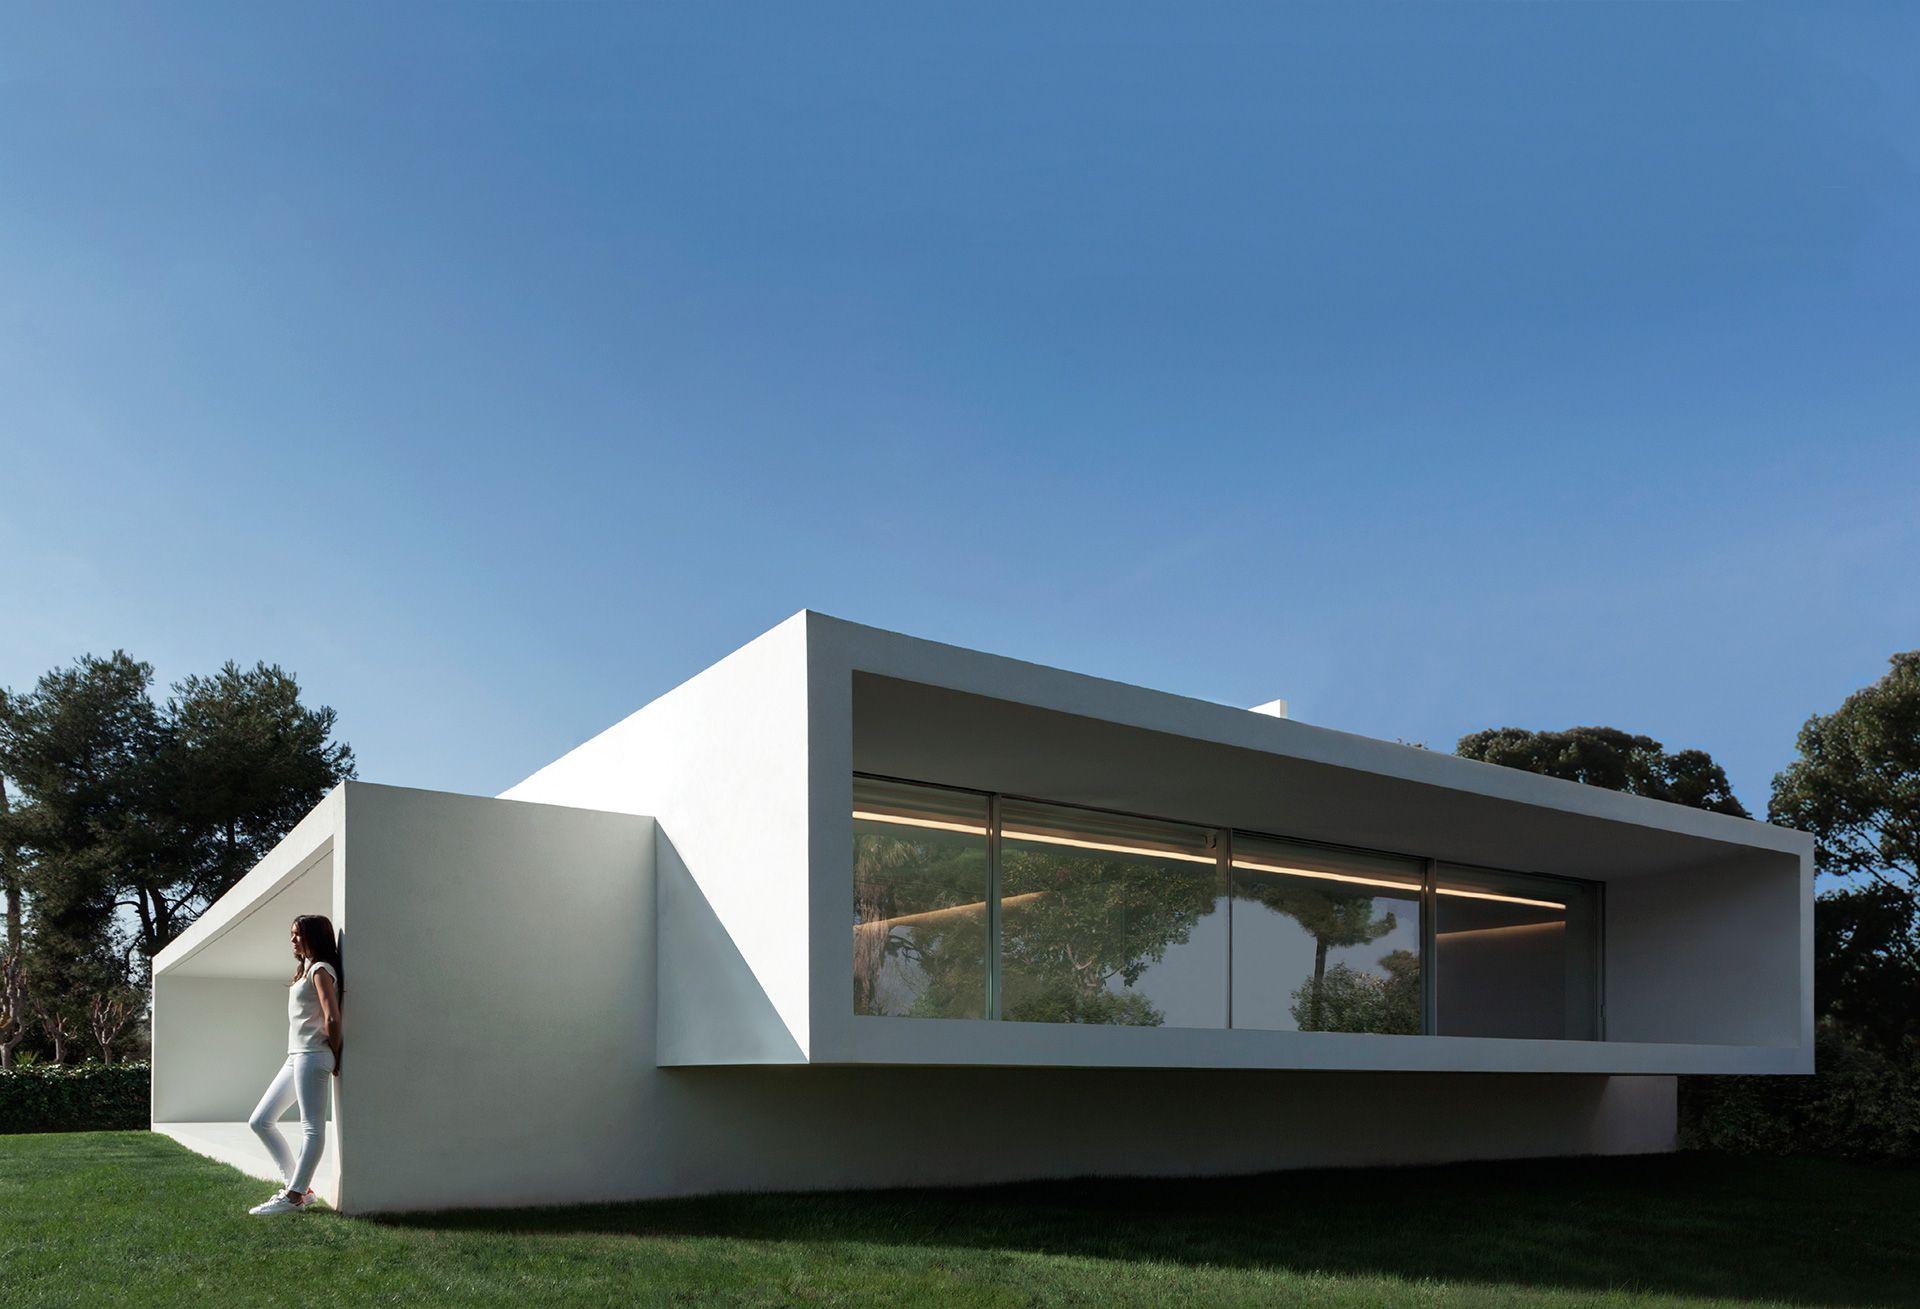 Fran silvestre arquitectos casa de la brisa house for Arquitectura moderna minimalista